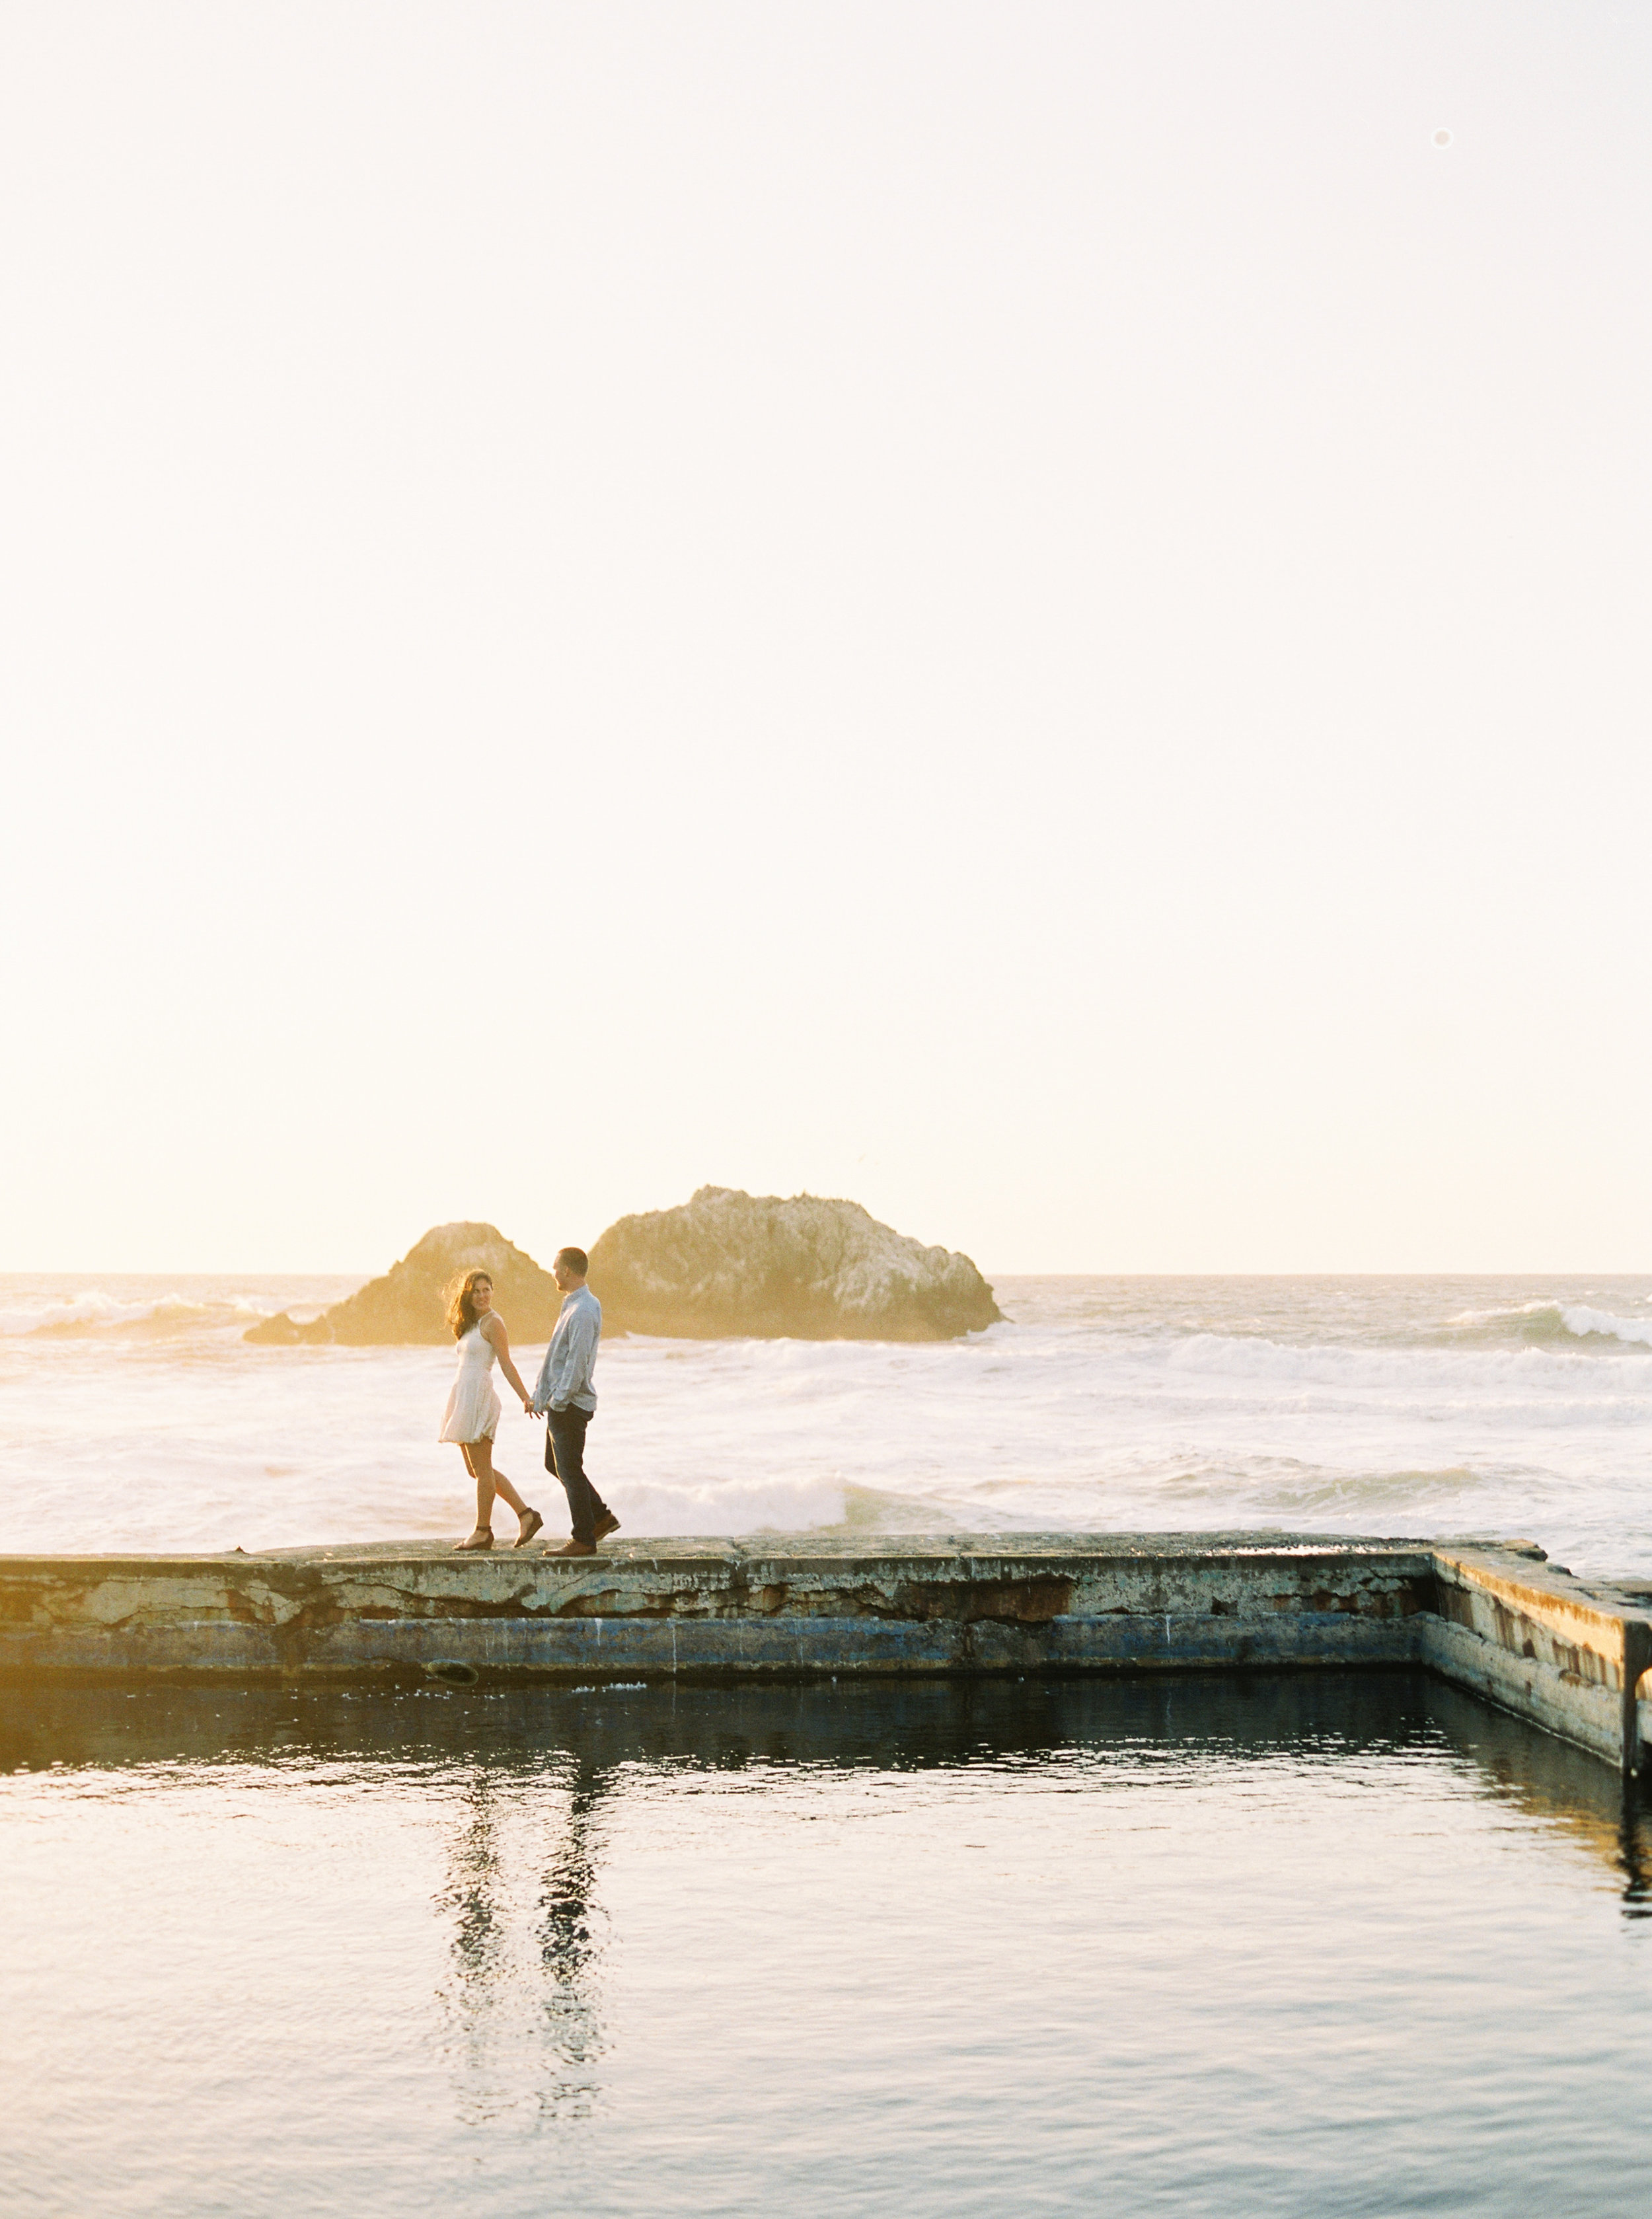 Sutro-baths-san-francisco-engagement-shoot-15.jpg